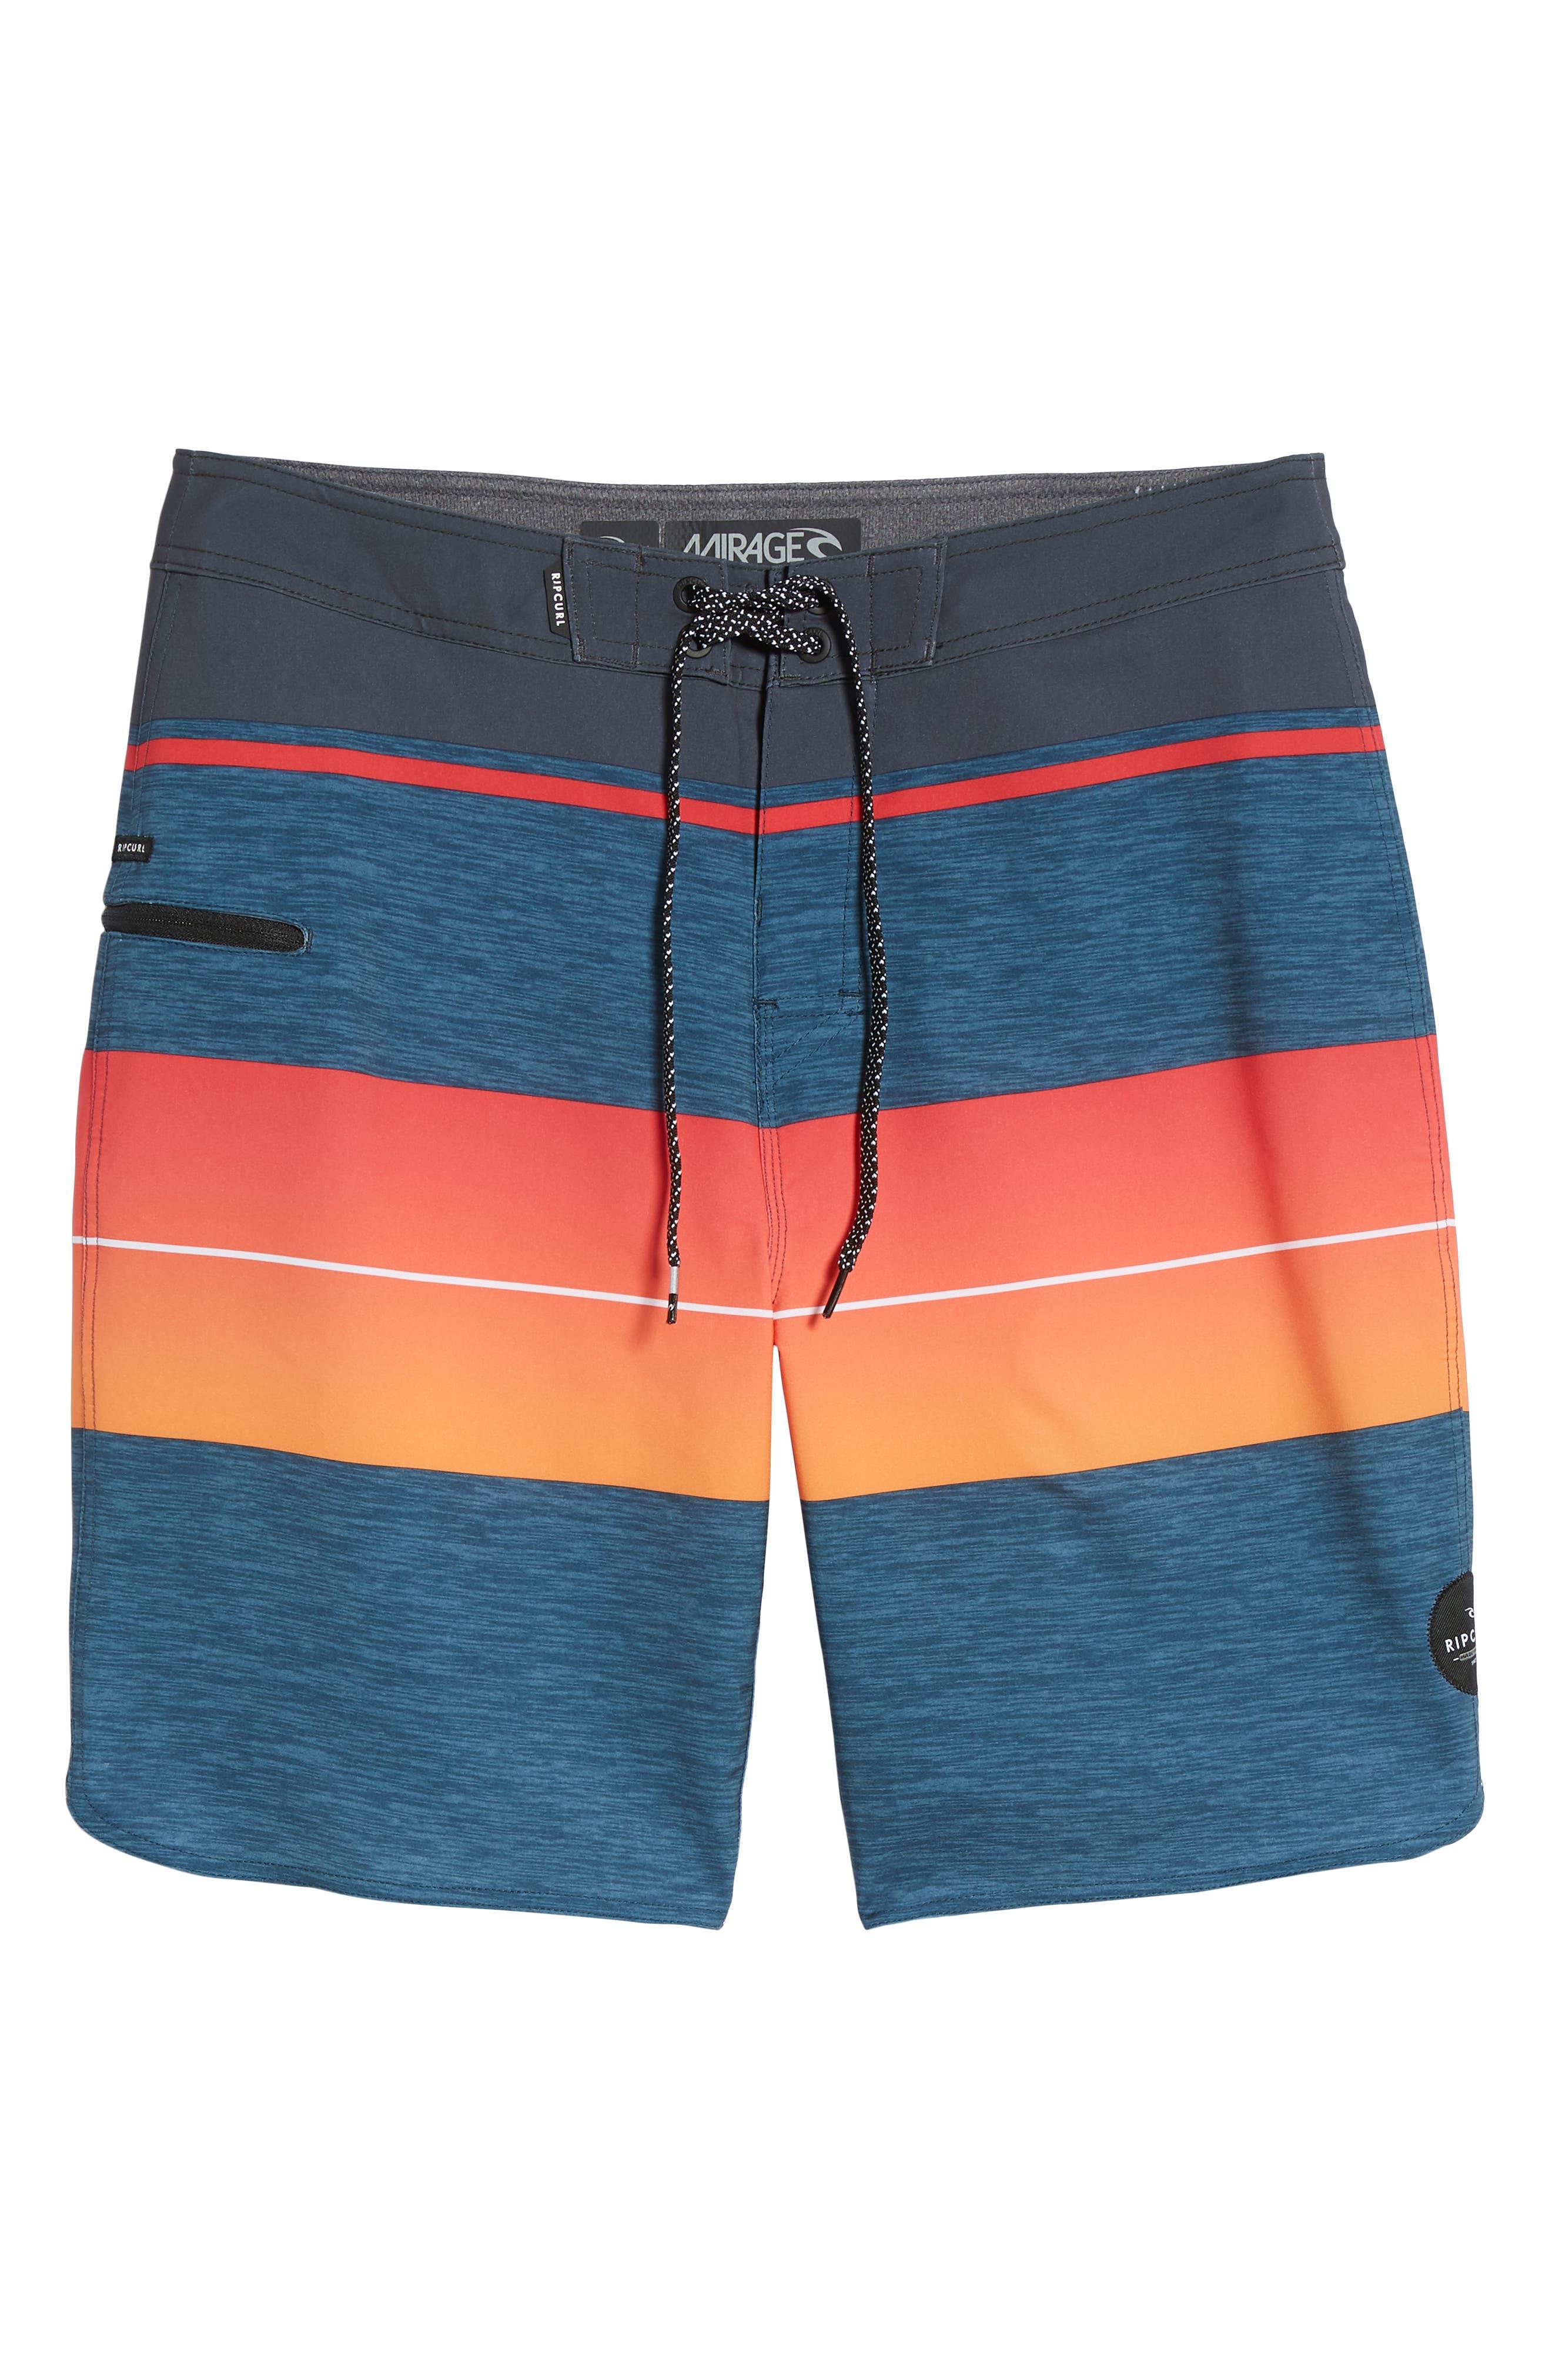 Mirage Eclipse Board Shorts,                             Alternate thumbnail 6, color,                             Orange